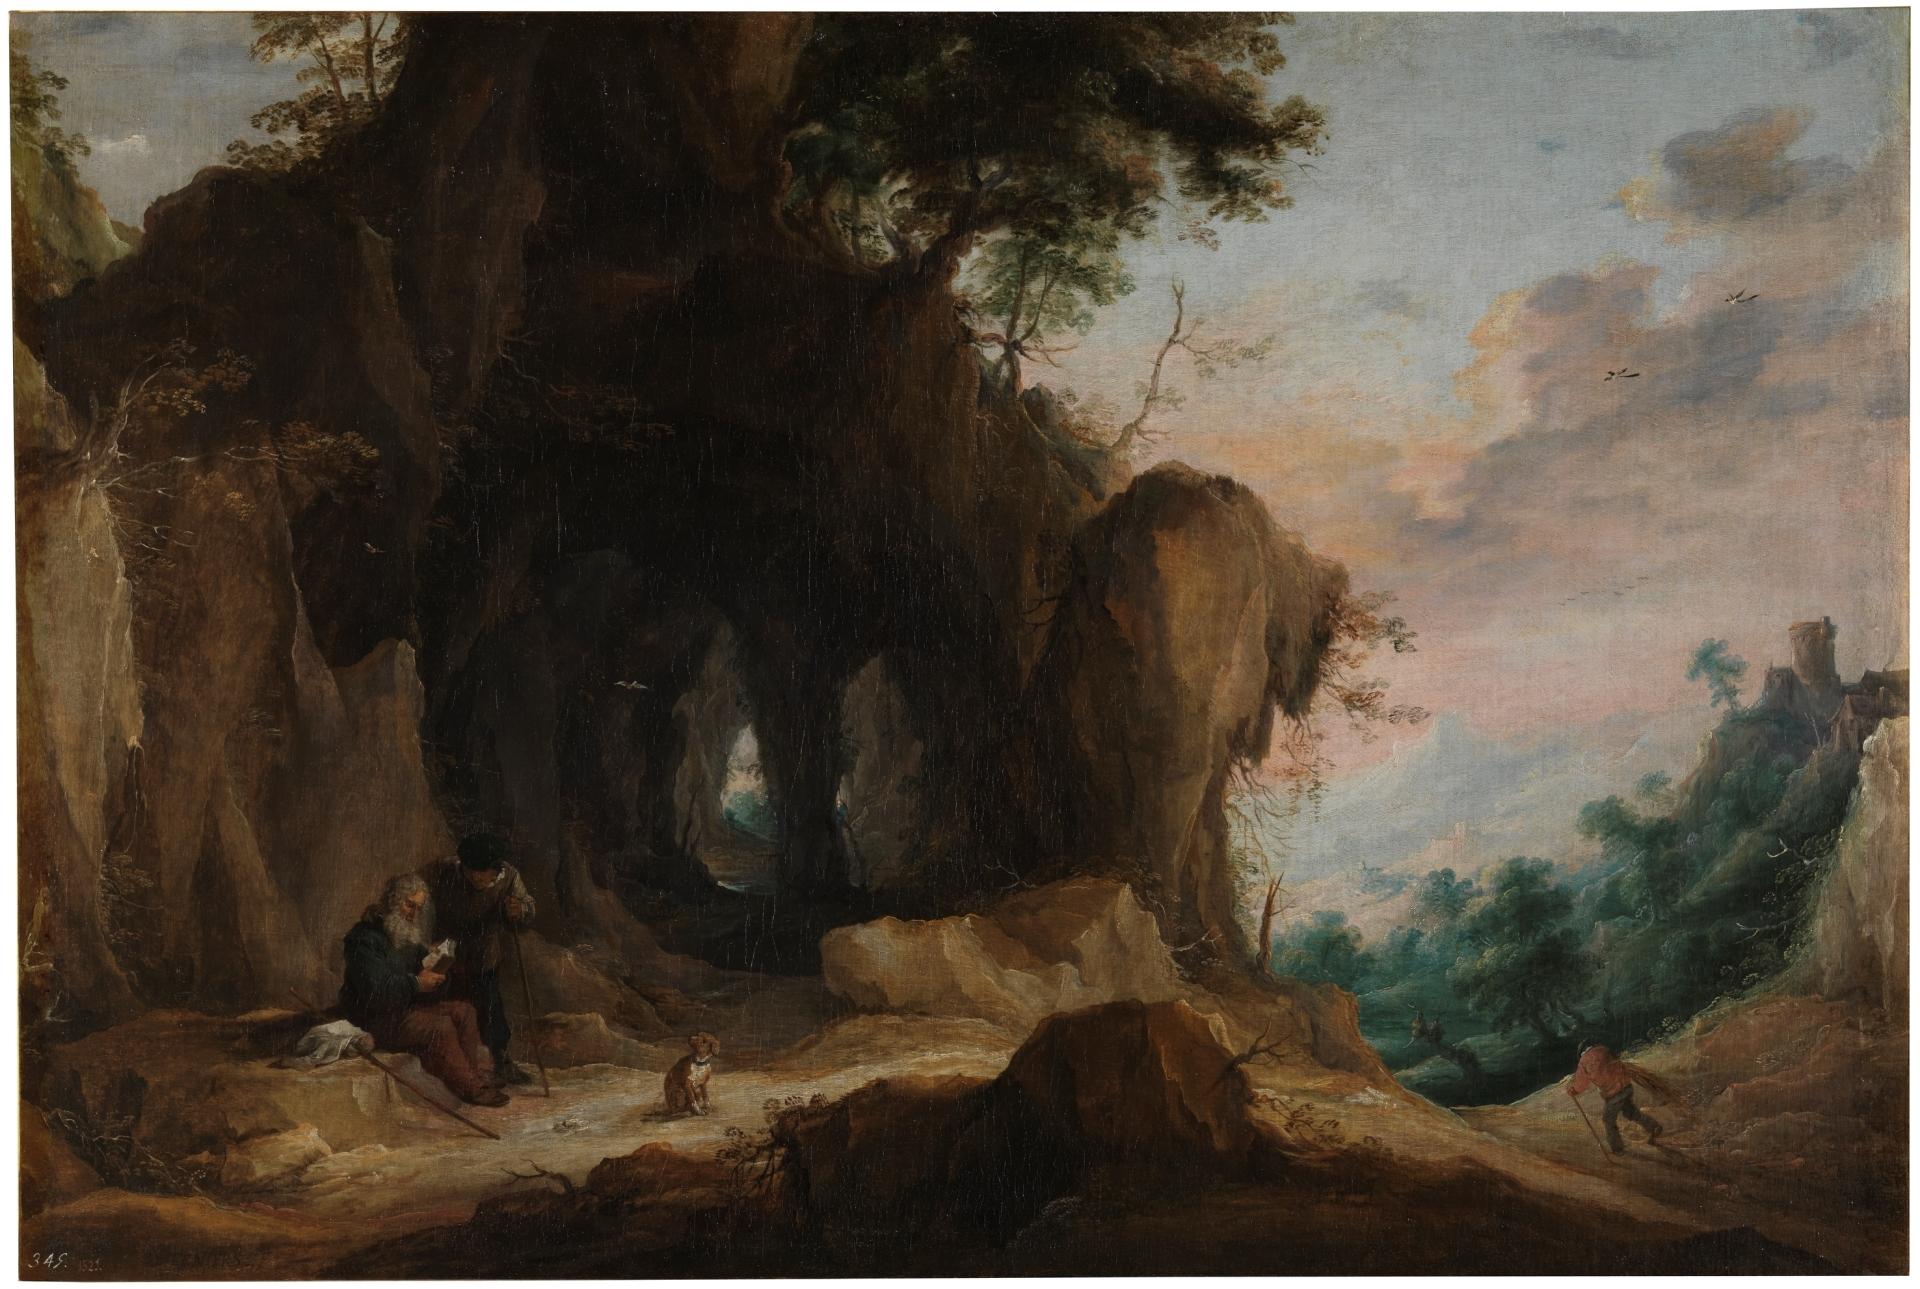 paisaje-con-un-ermitano